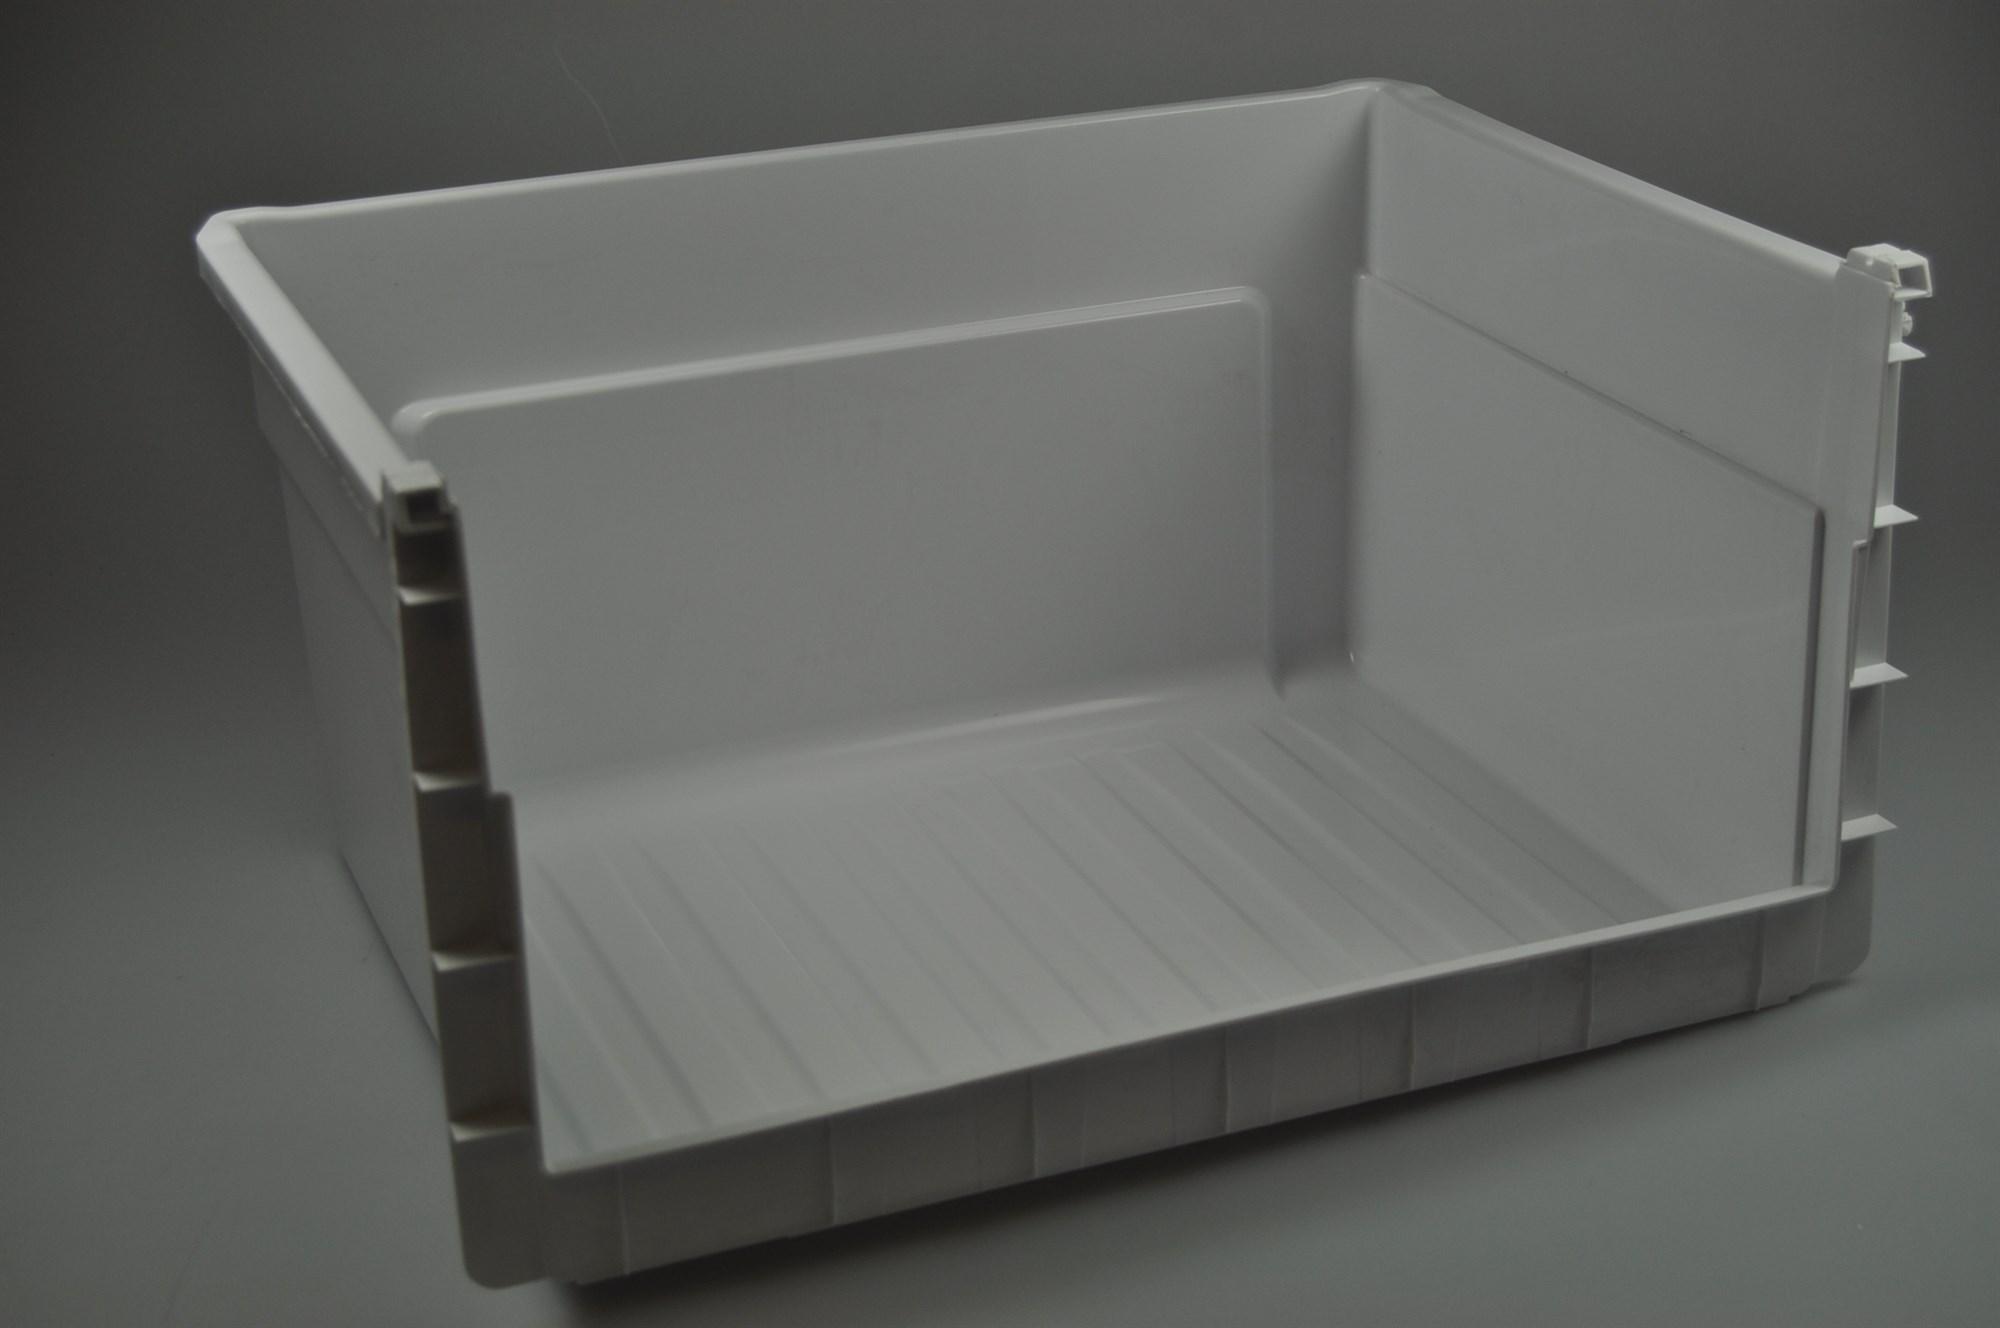 bac l gumes samsung r frig rateur cong lateur style am ricain inf rieur. Black Bedroom Furniture Sets. Home Design Ideas